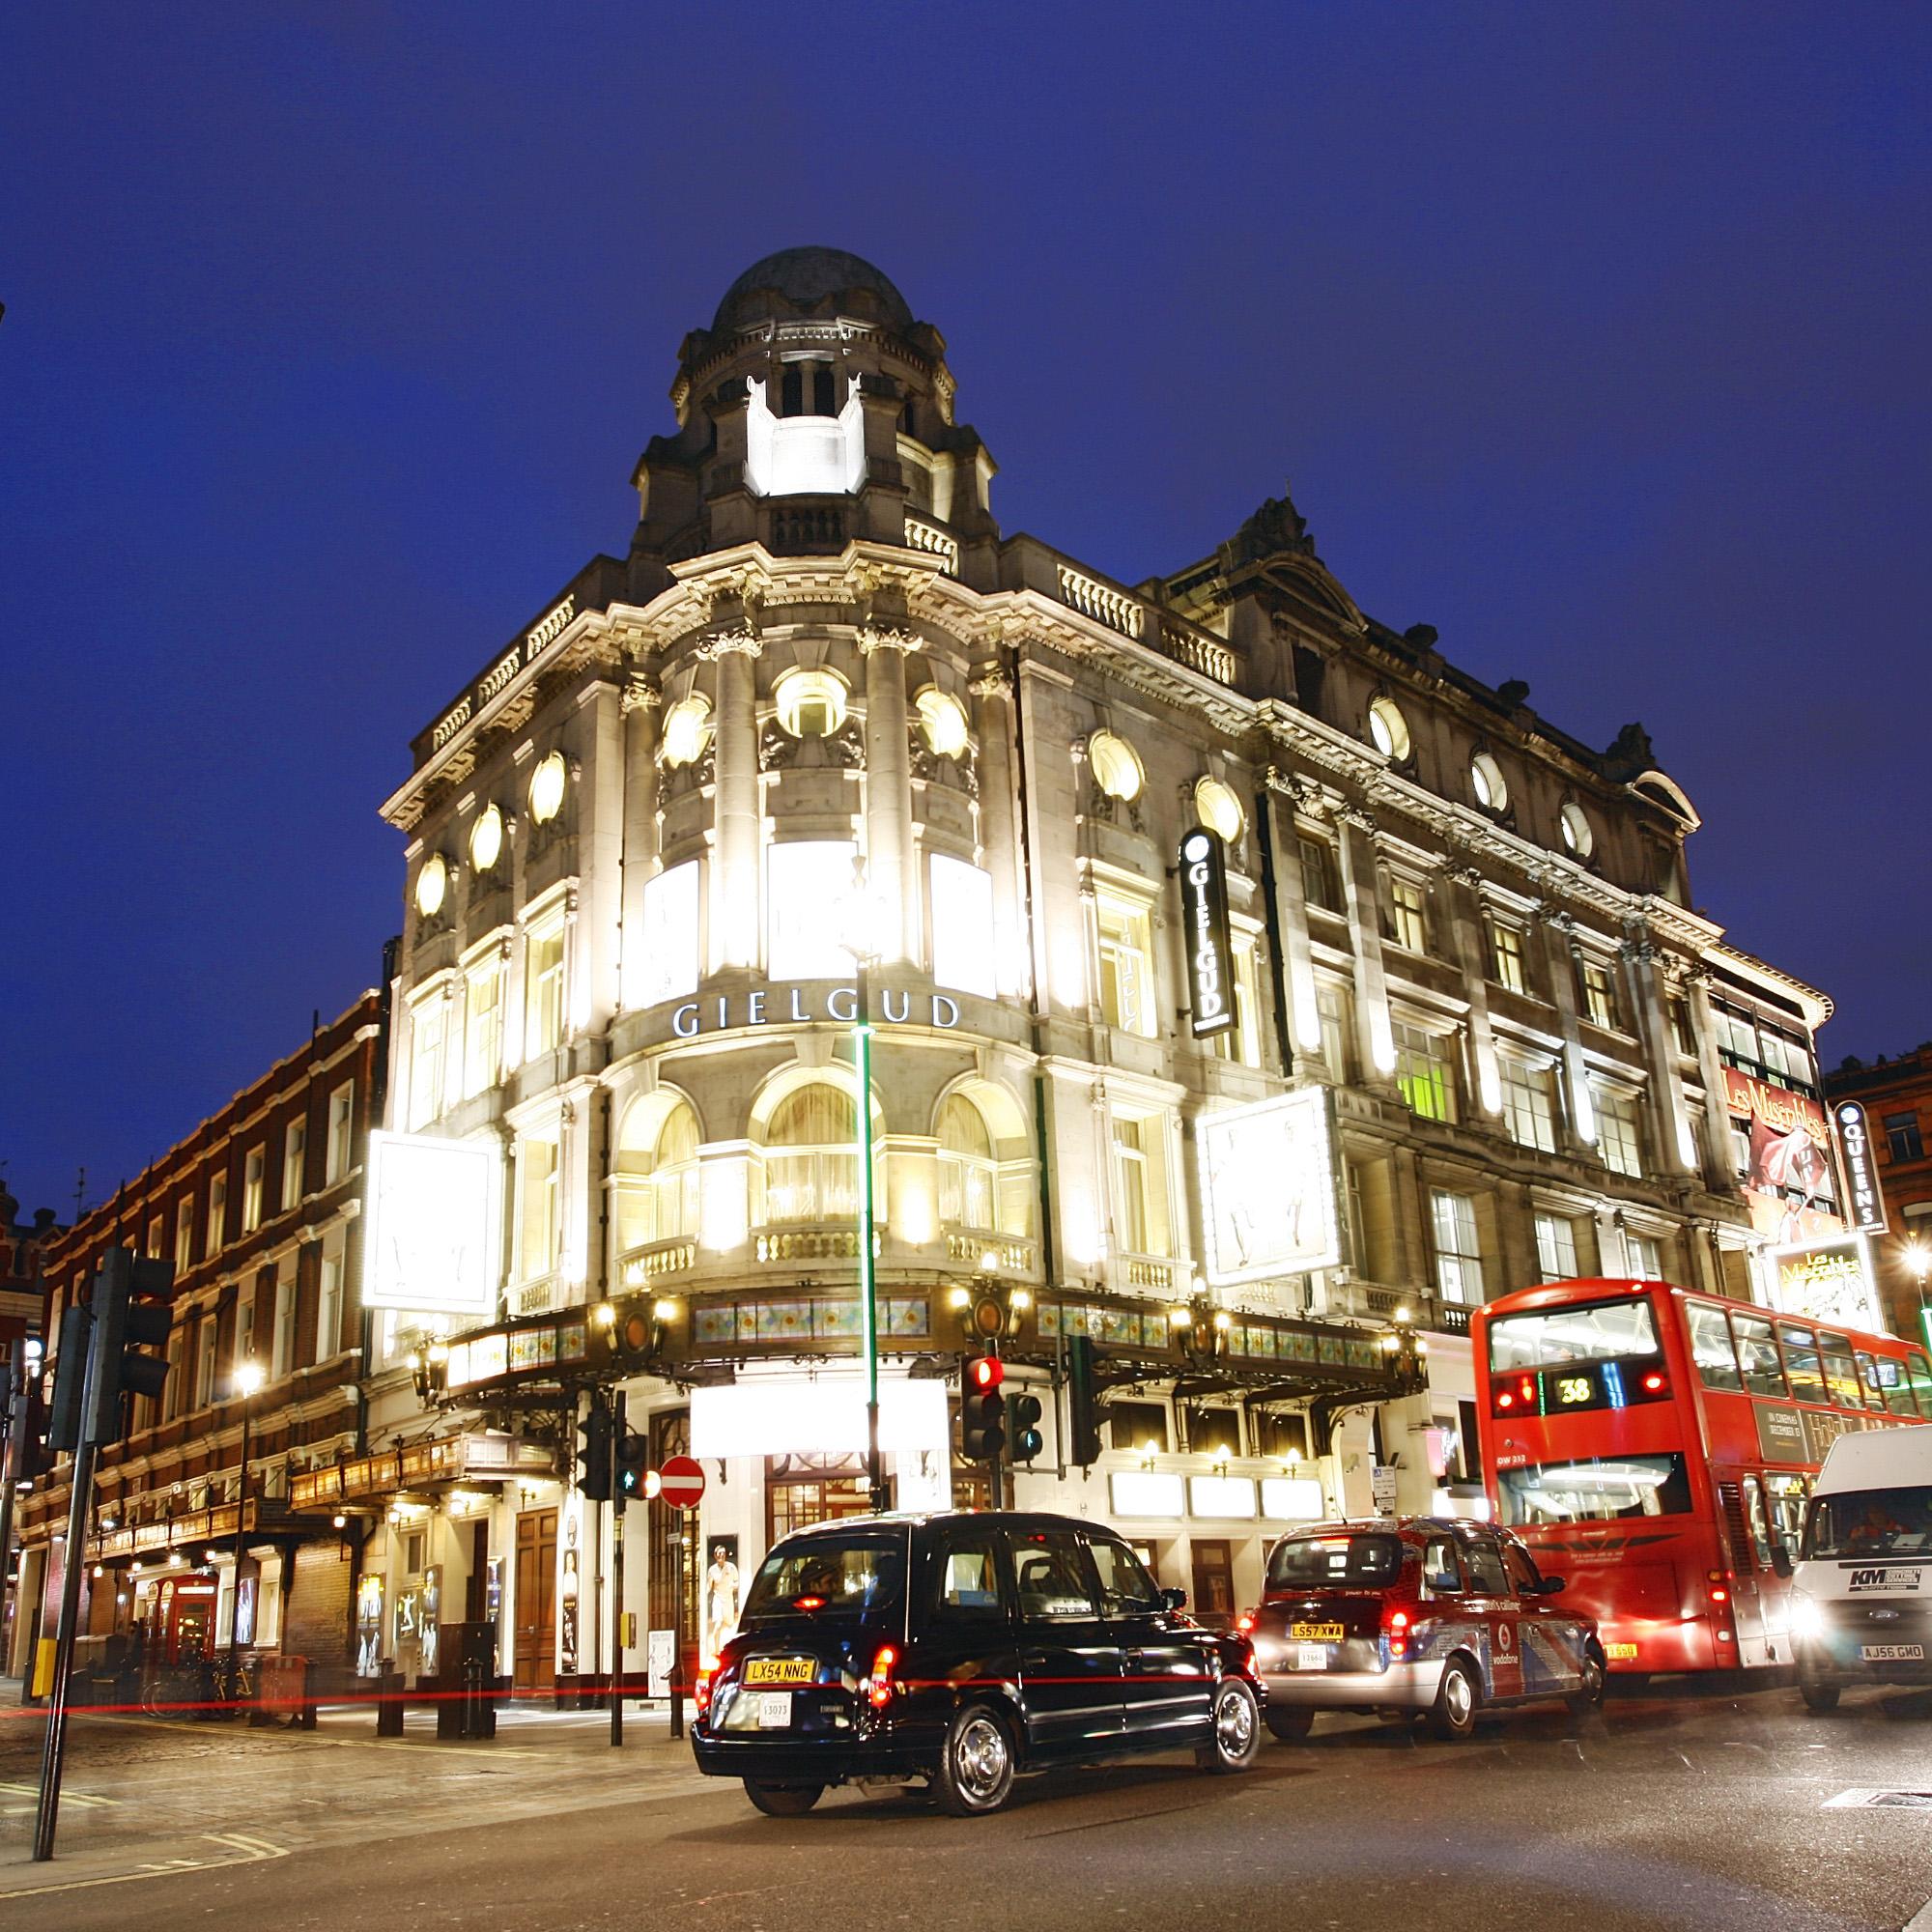 Gielgud Theatre, London - 0